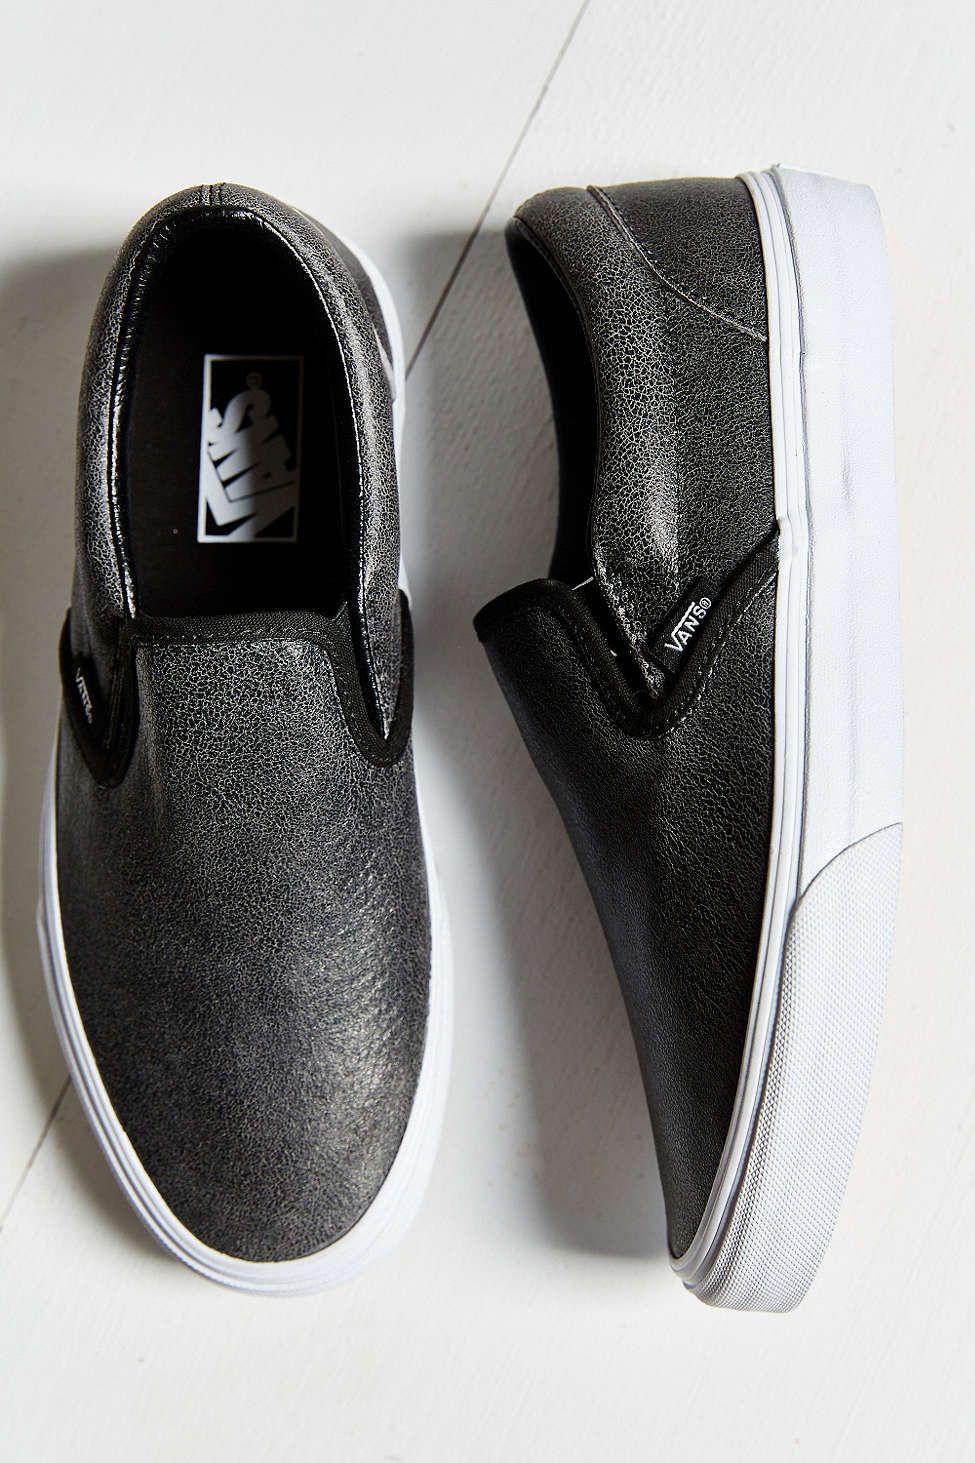 22c44985a7 Vans Cracked Leather Slip-On Shoe